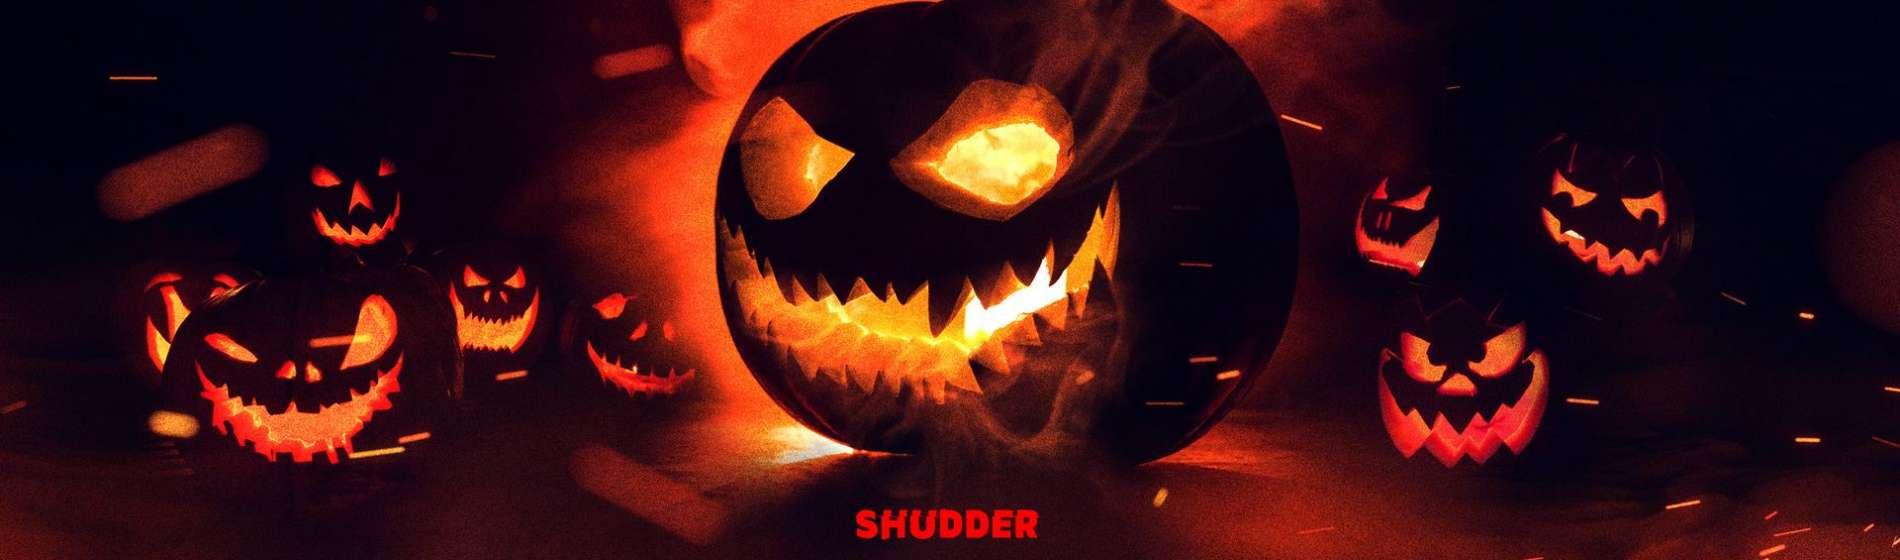 Shudder-61DaysHalloween_vert (1)